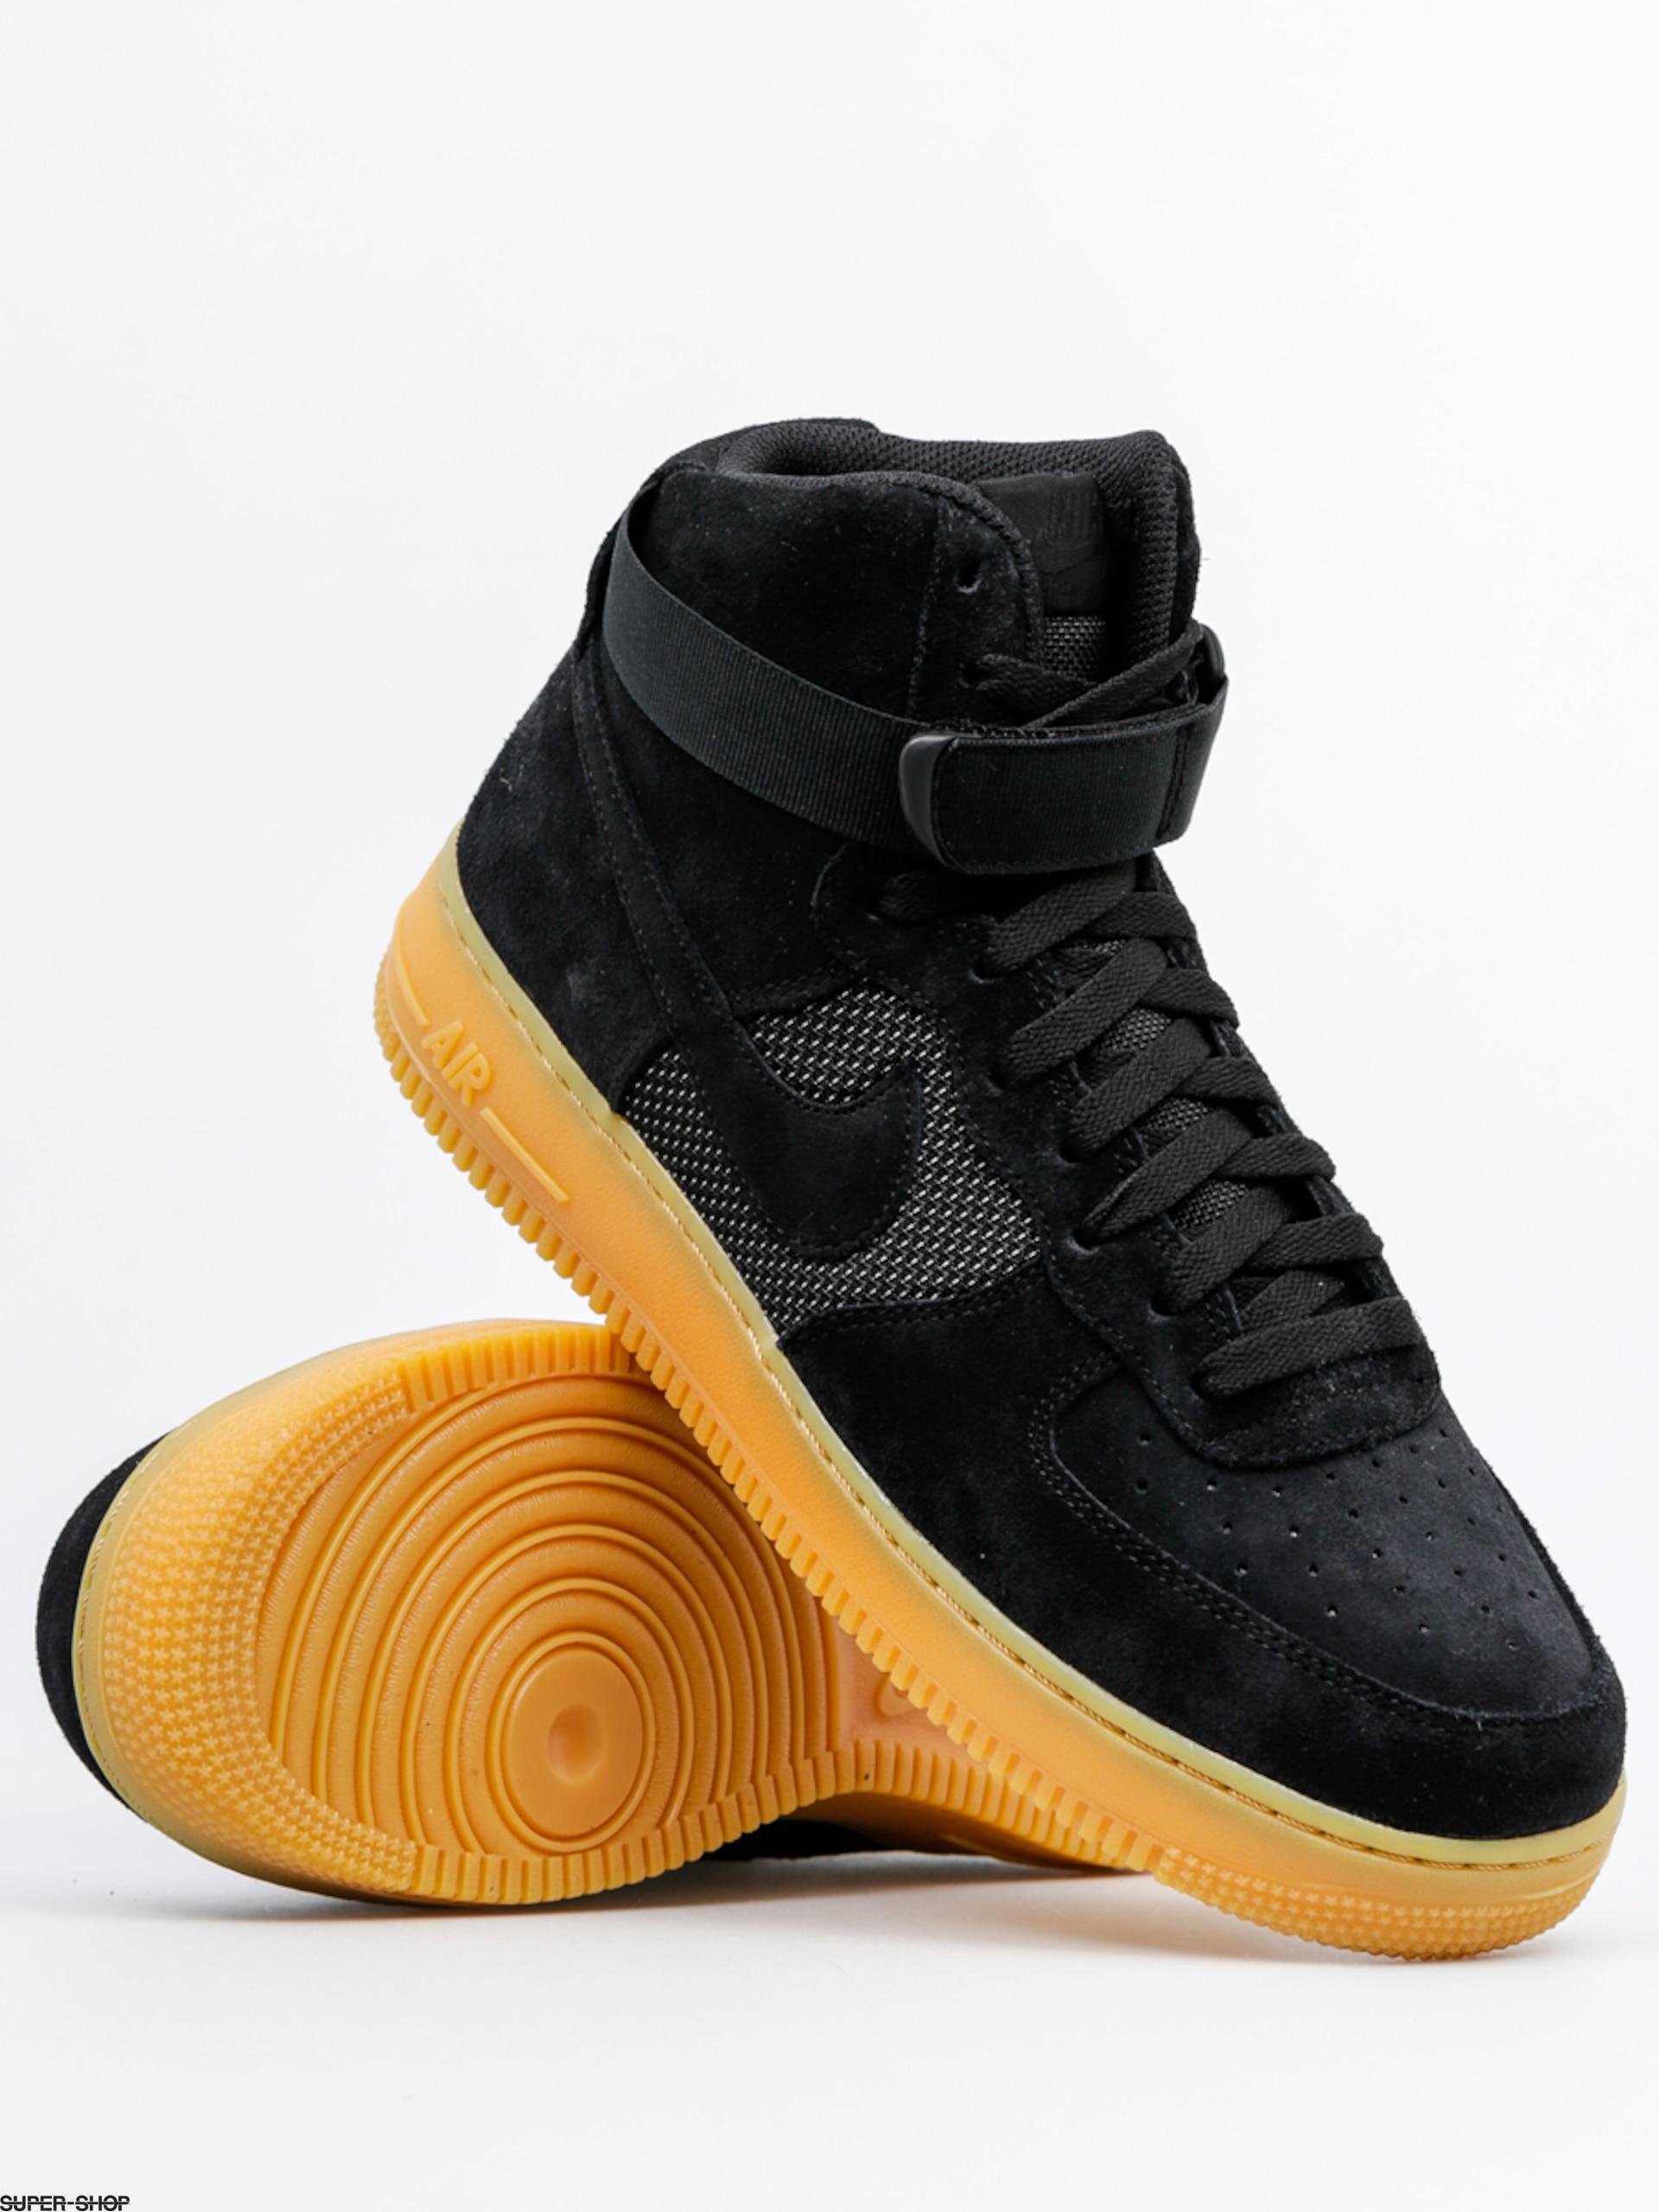 best cheap de7d8 5fb66 Nike Schuhe Air Force 1 High 07 Lv8 (black/black gum light brown)